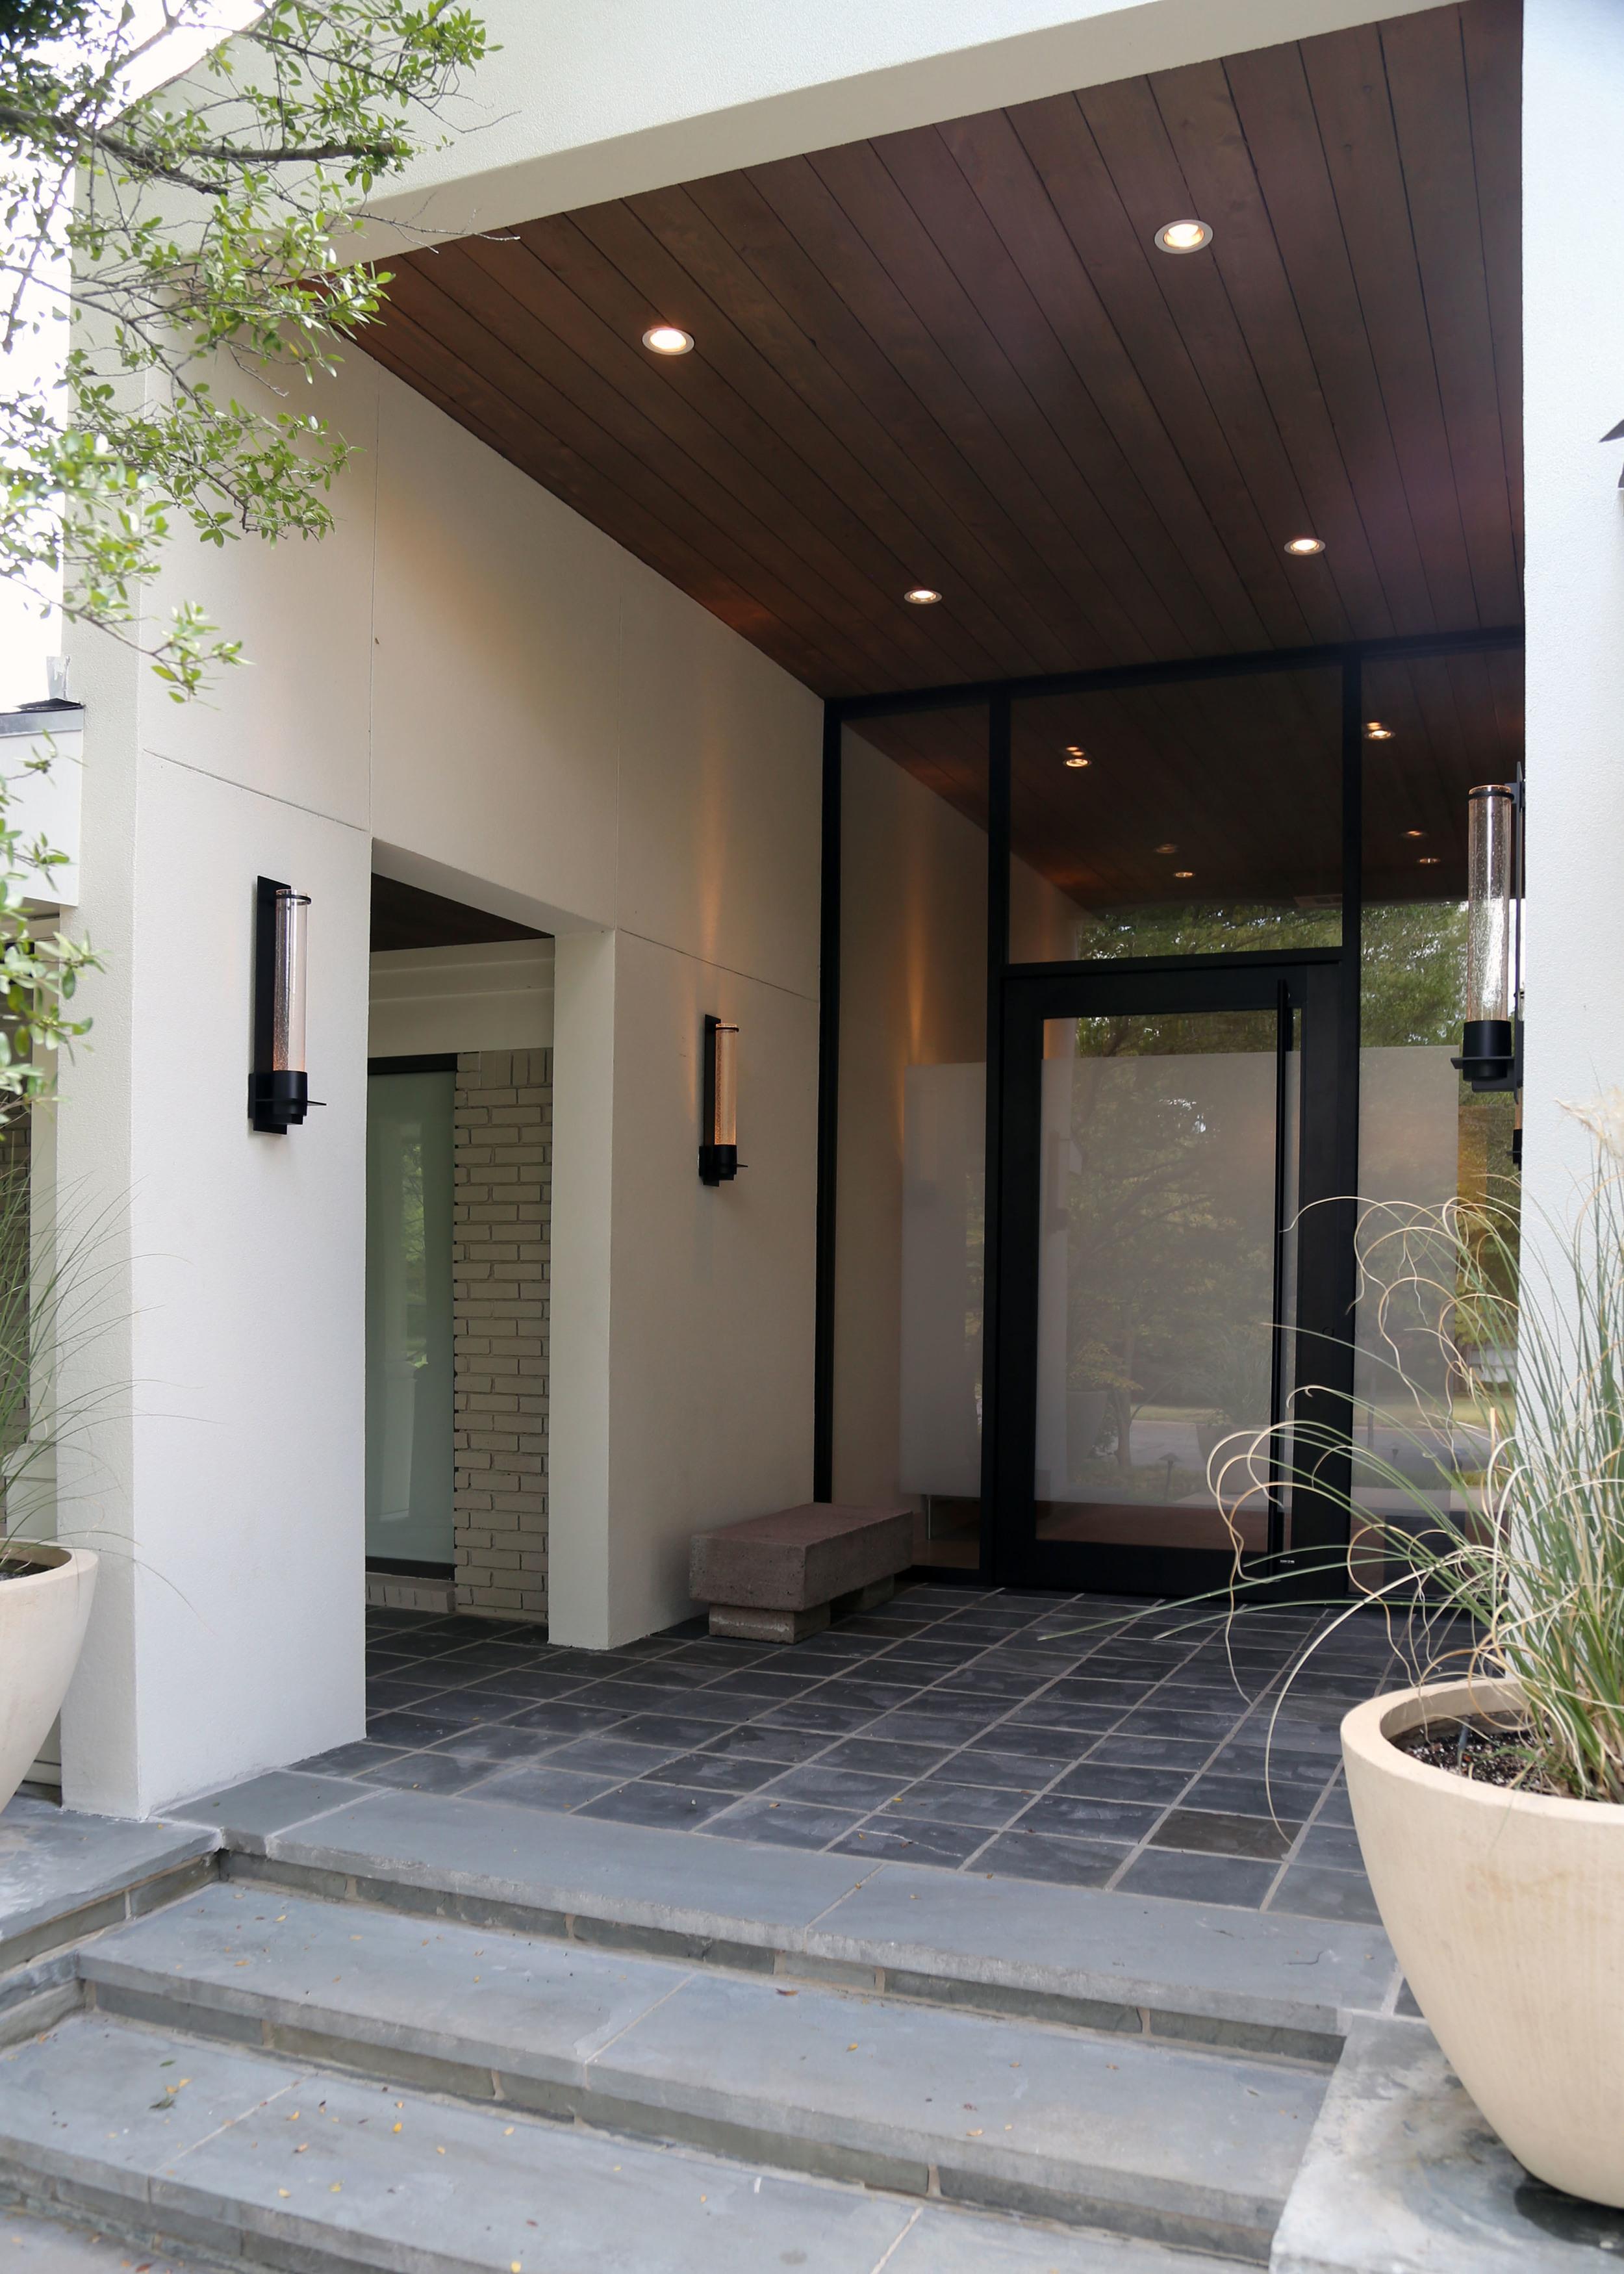 ND House Reno Exterior Entry 01.jpg